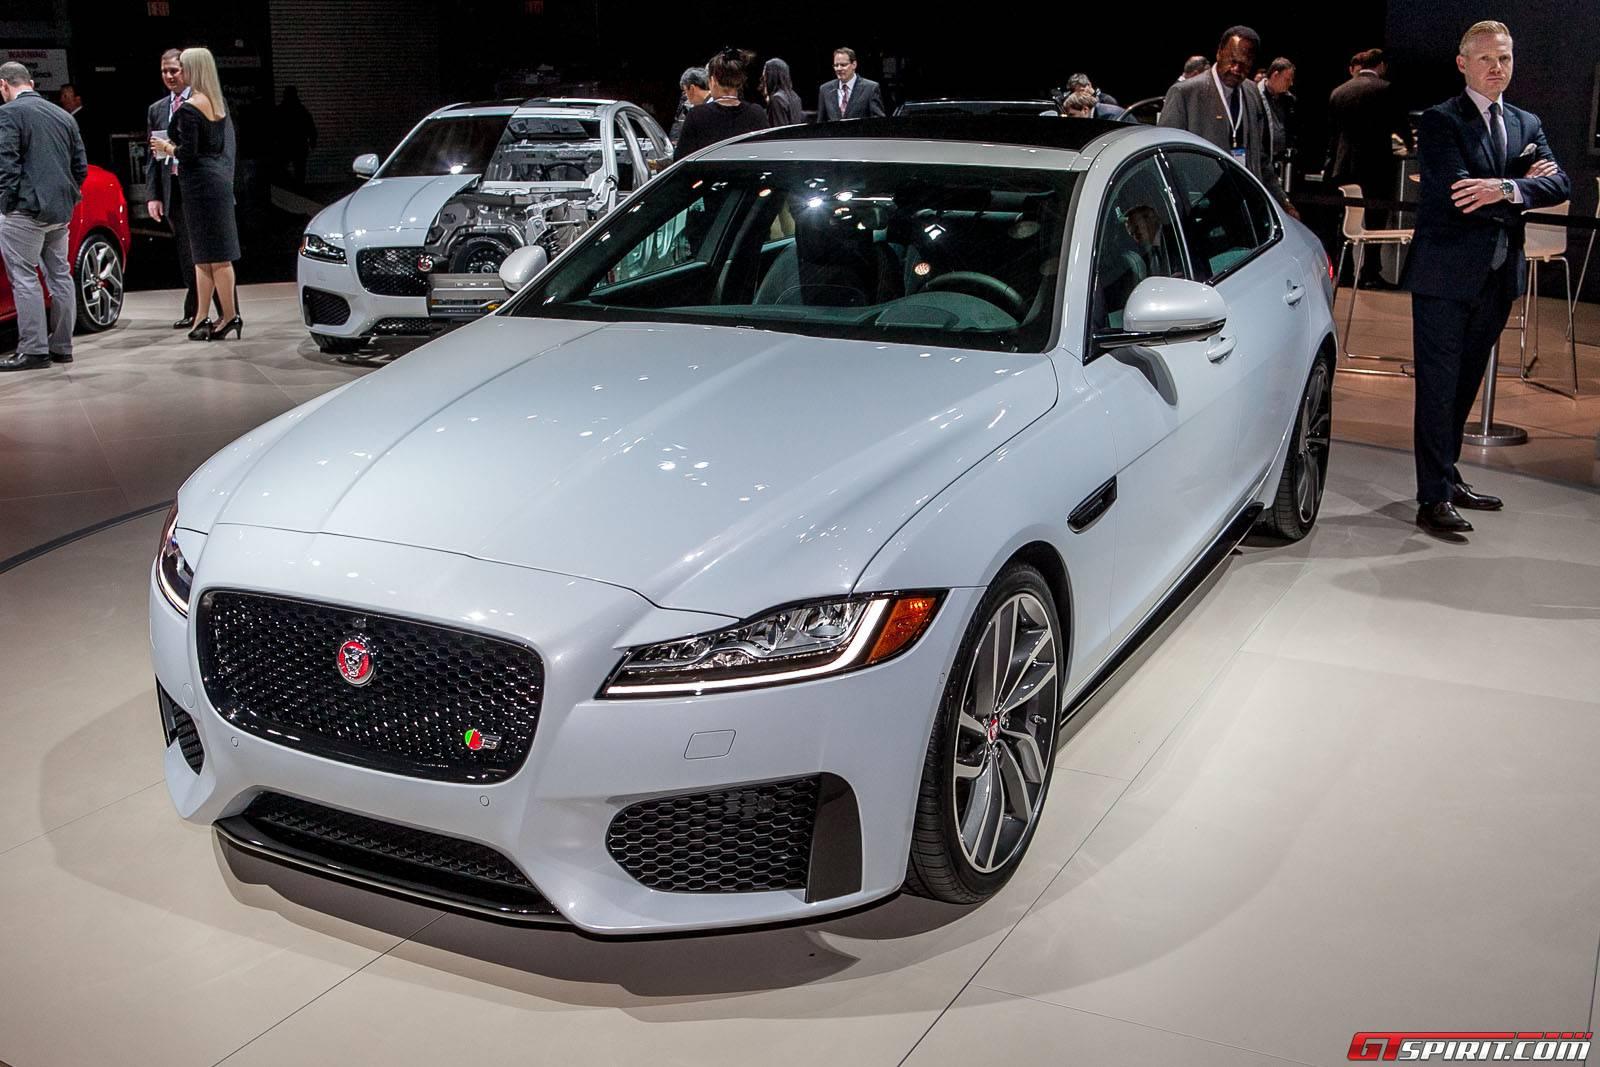 jaguar joyride front trends sport xf review cars digital awd angle